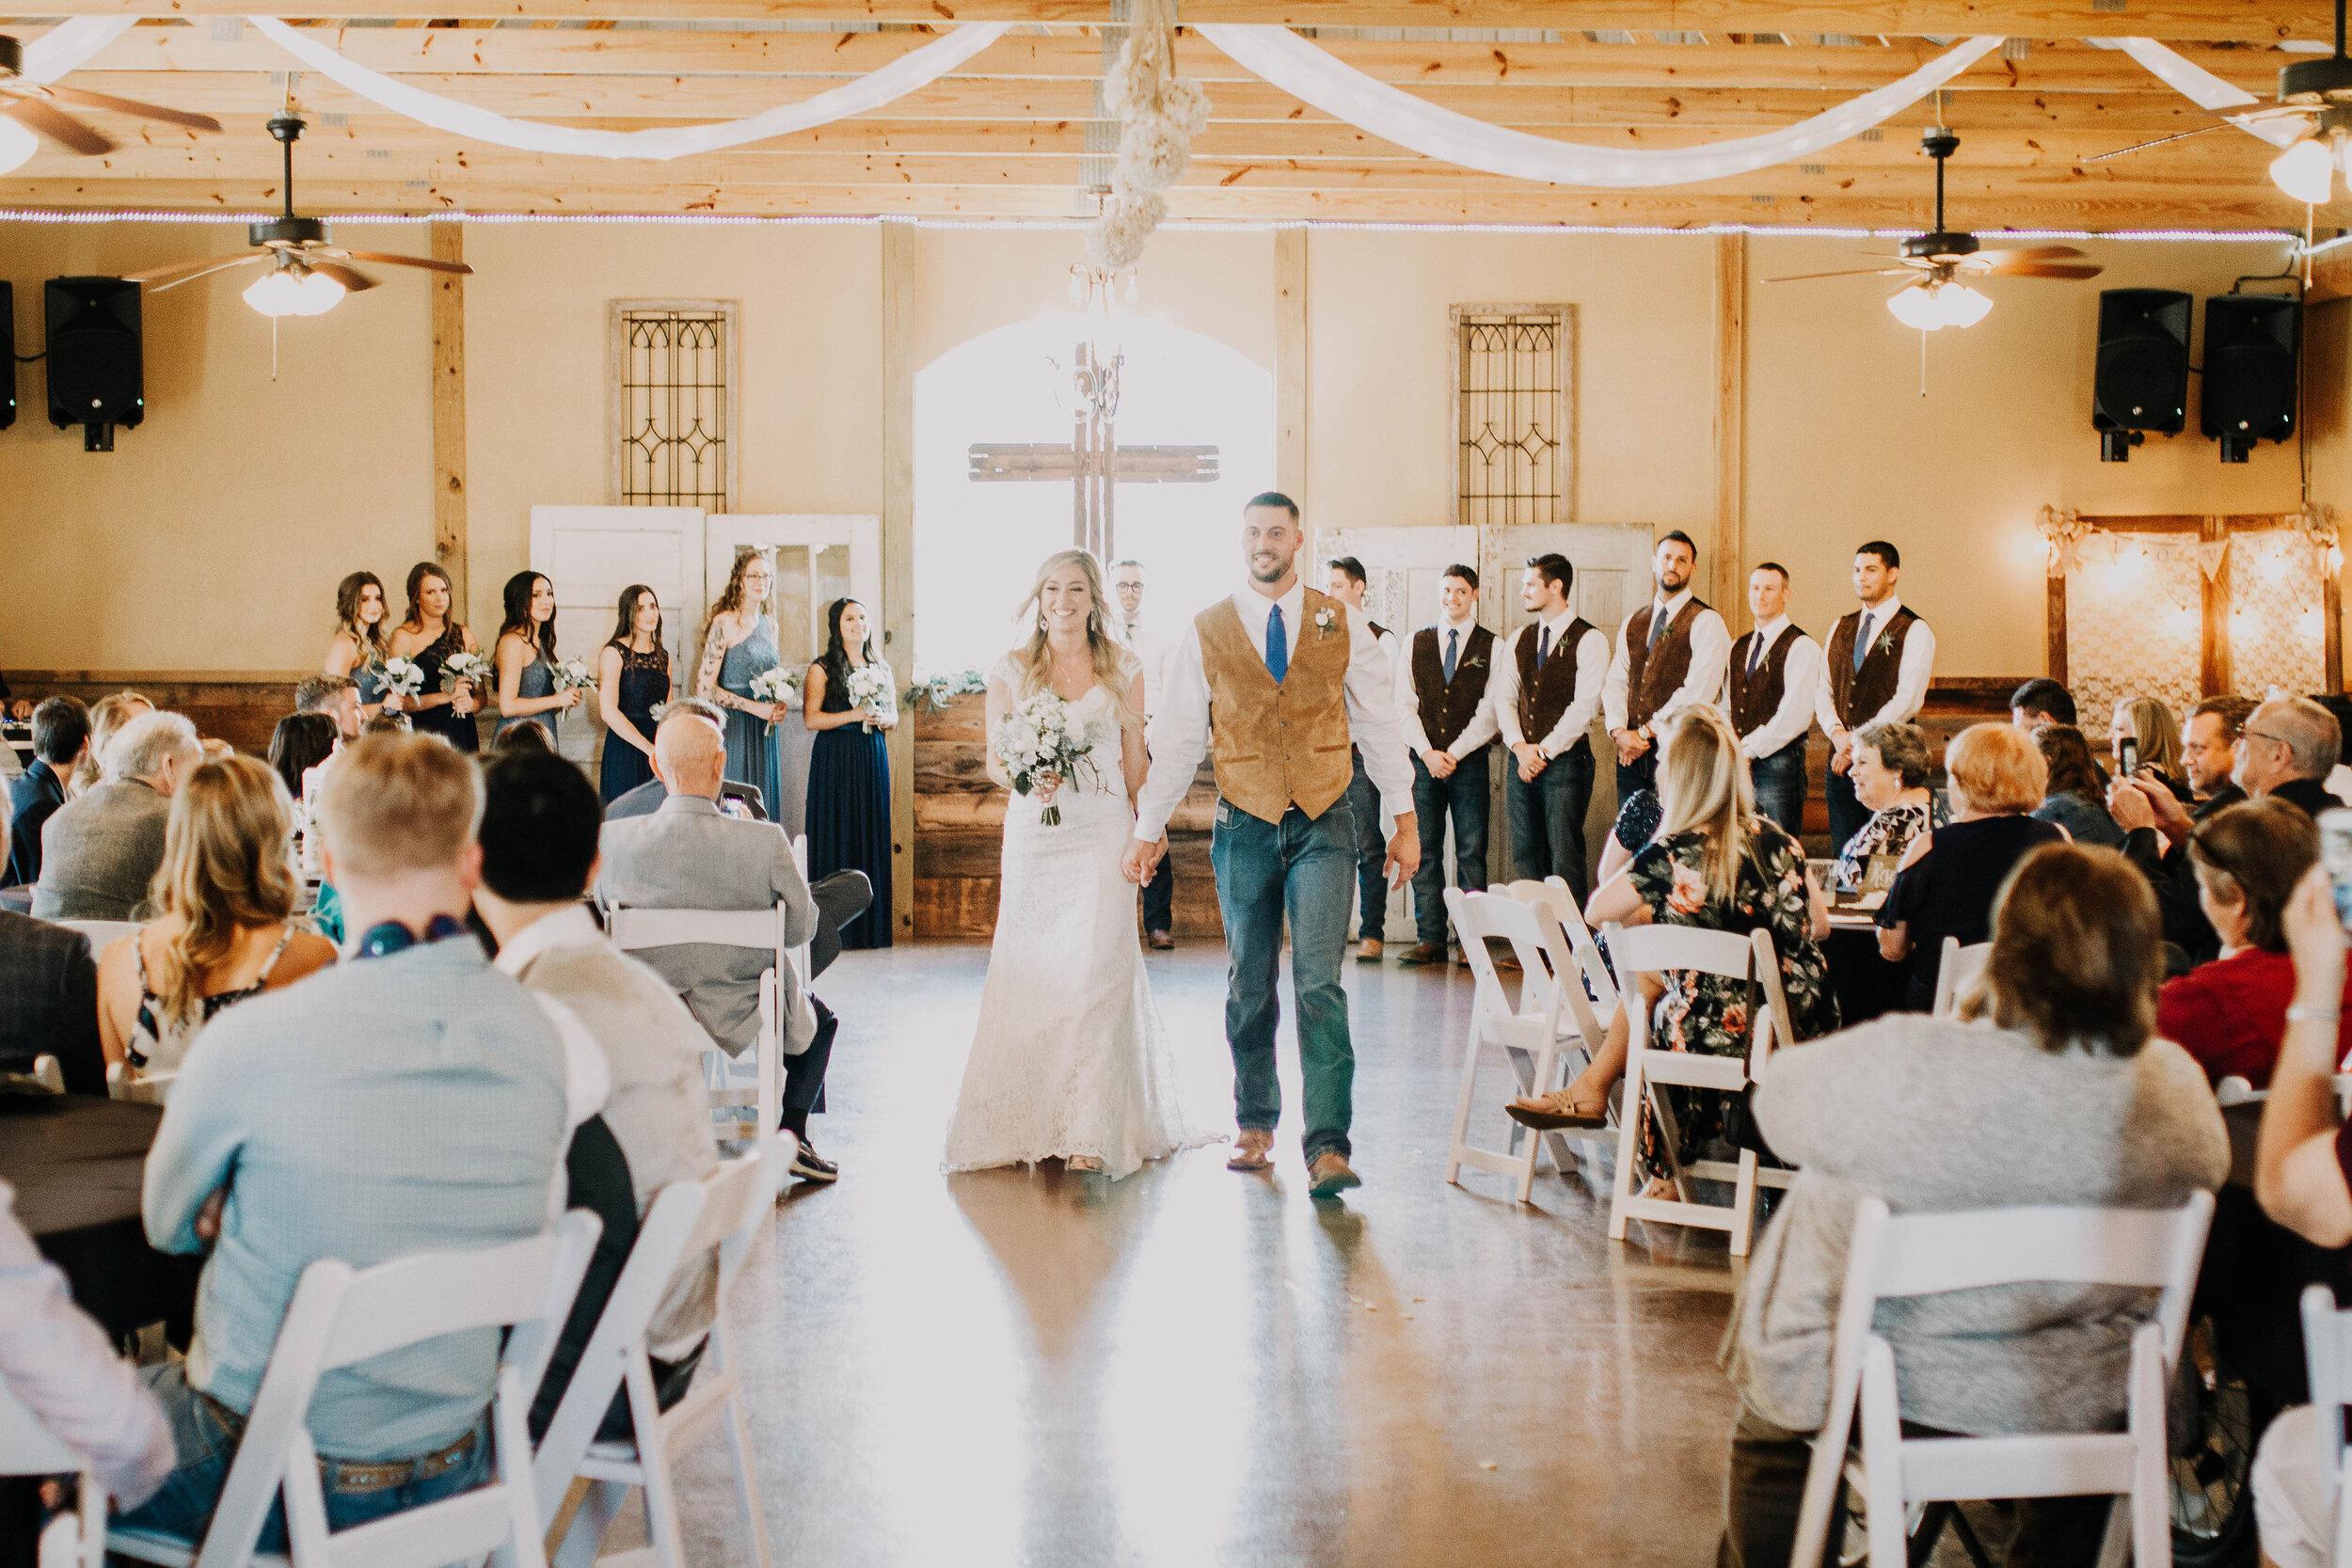 Bring Your Own Alcohol Wedding A Big Money Savor